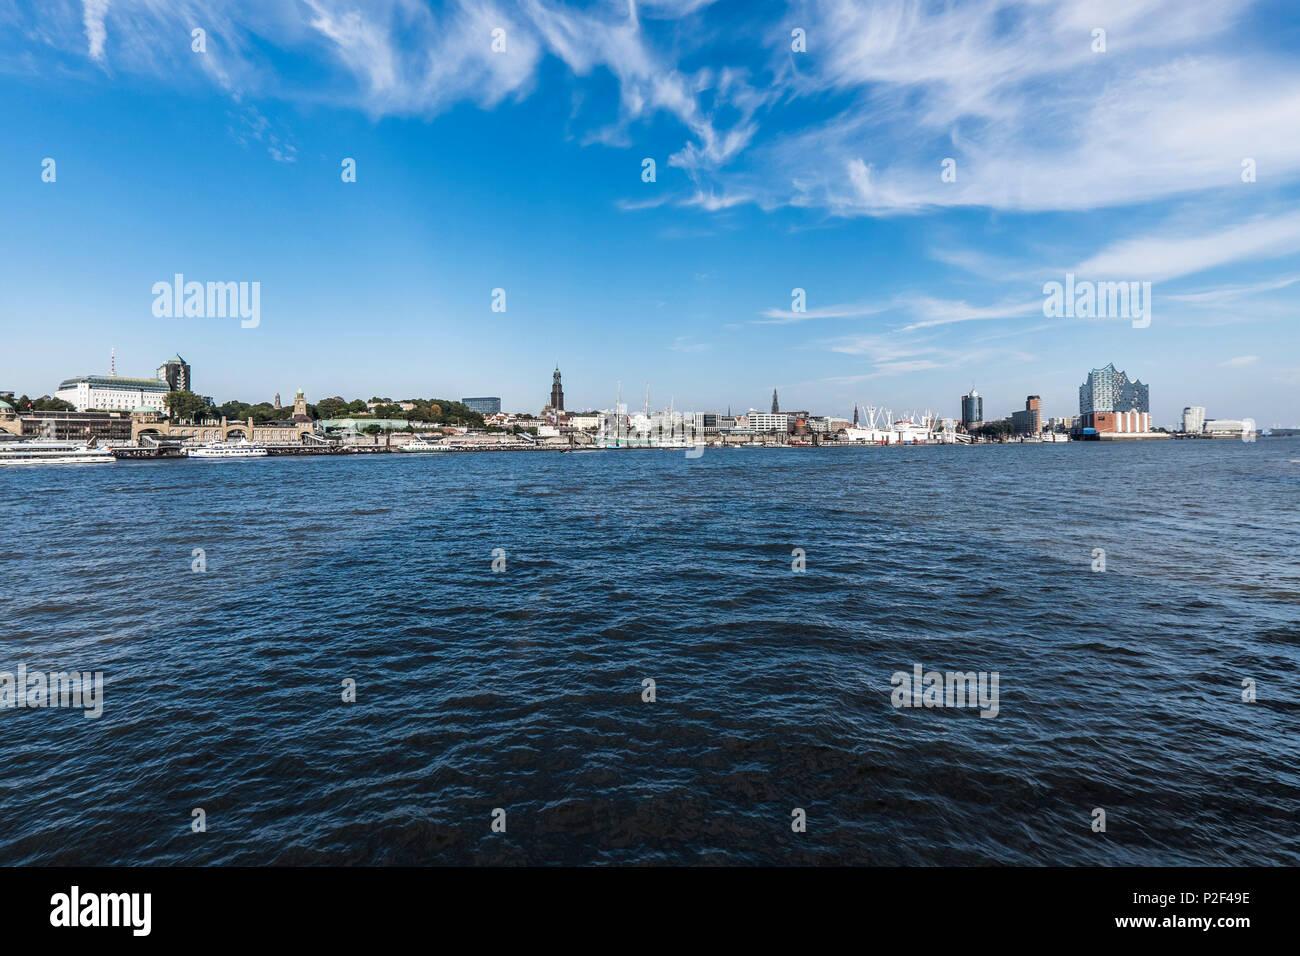 view to the skyline of Hamburg and the Hafencity, Hamburg, north Germany, Germany - Stock Image